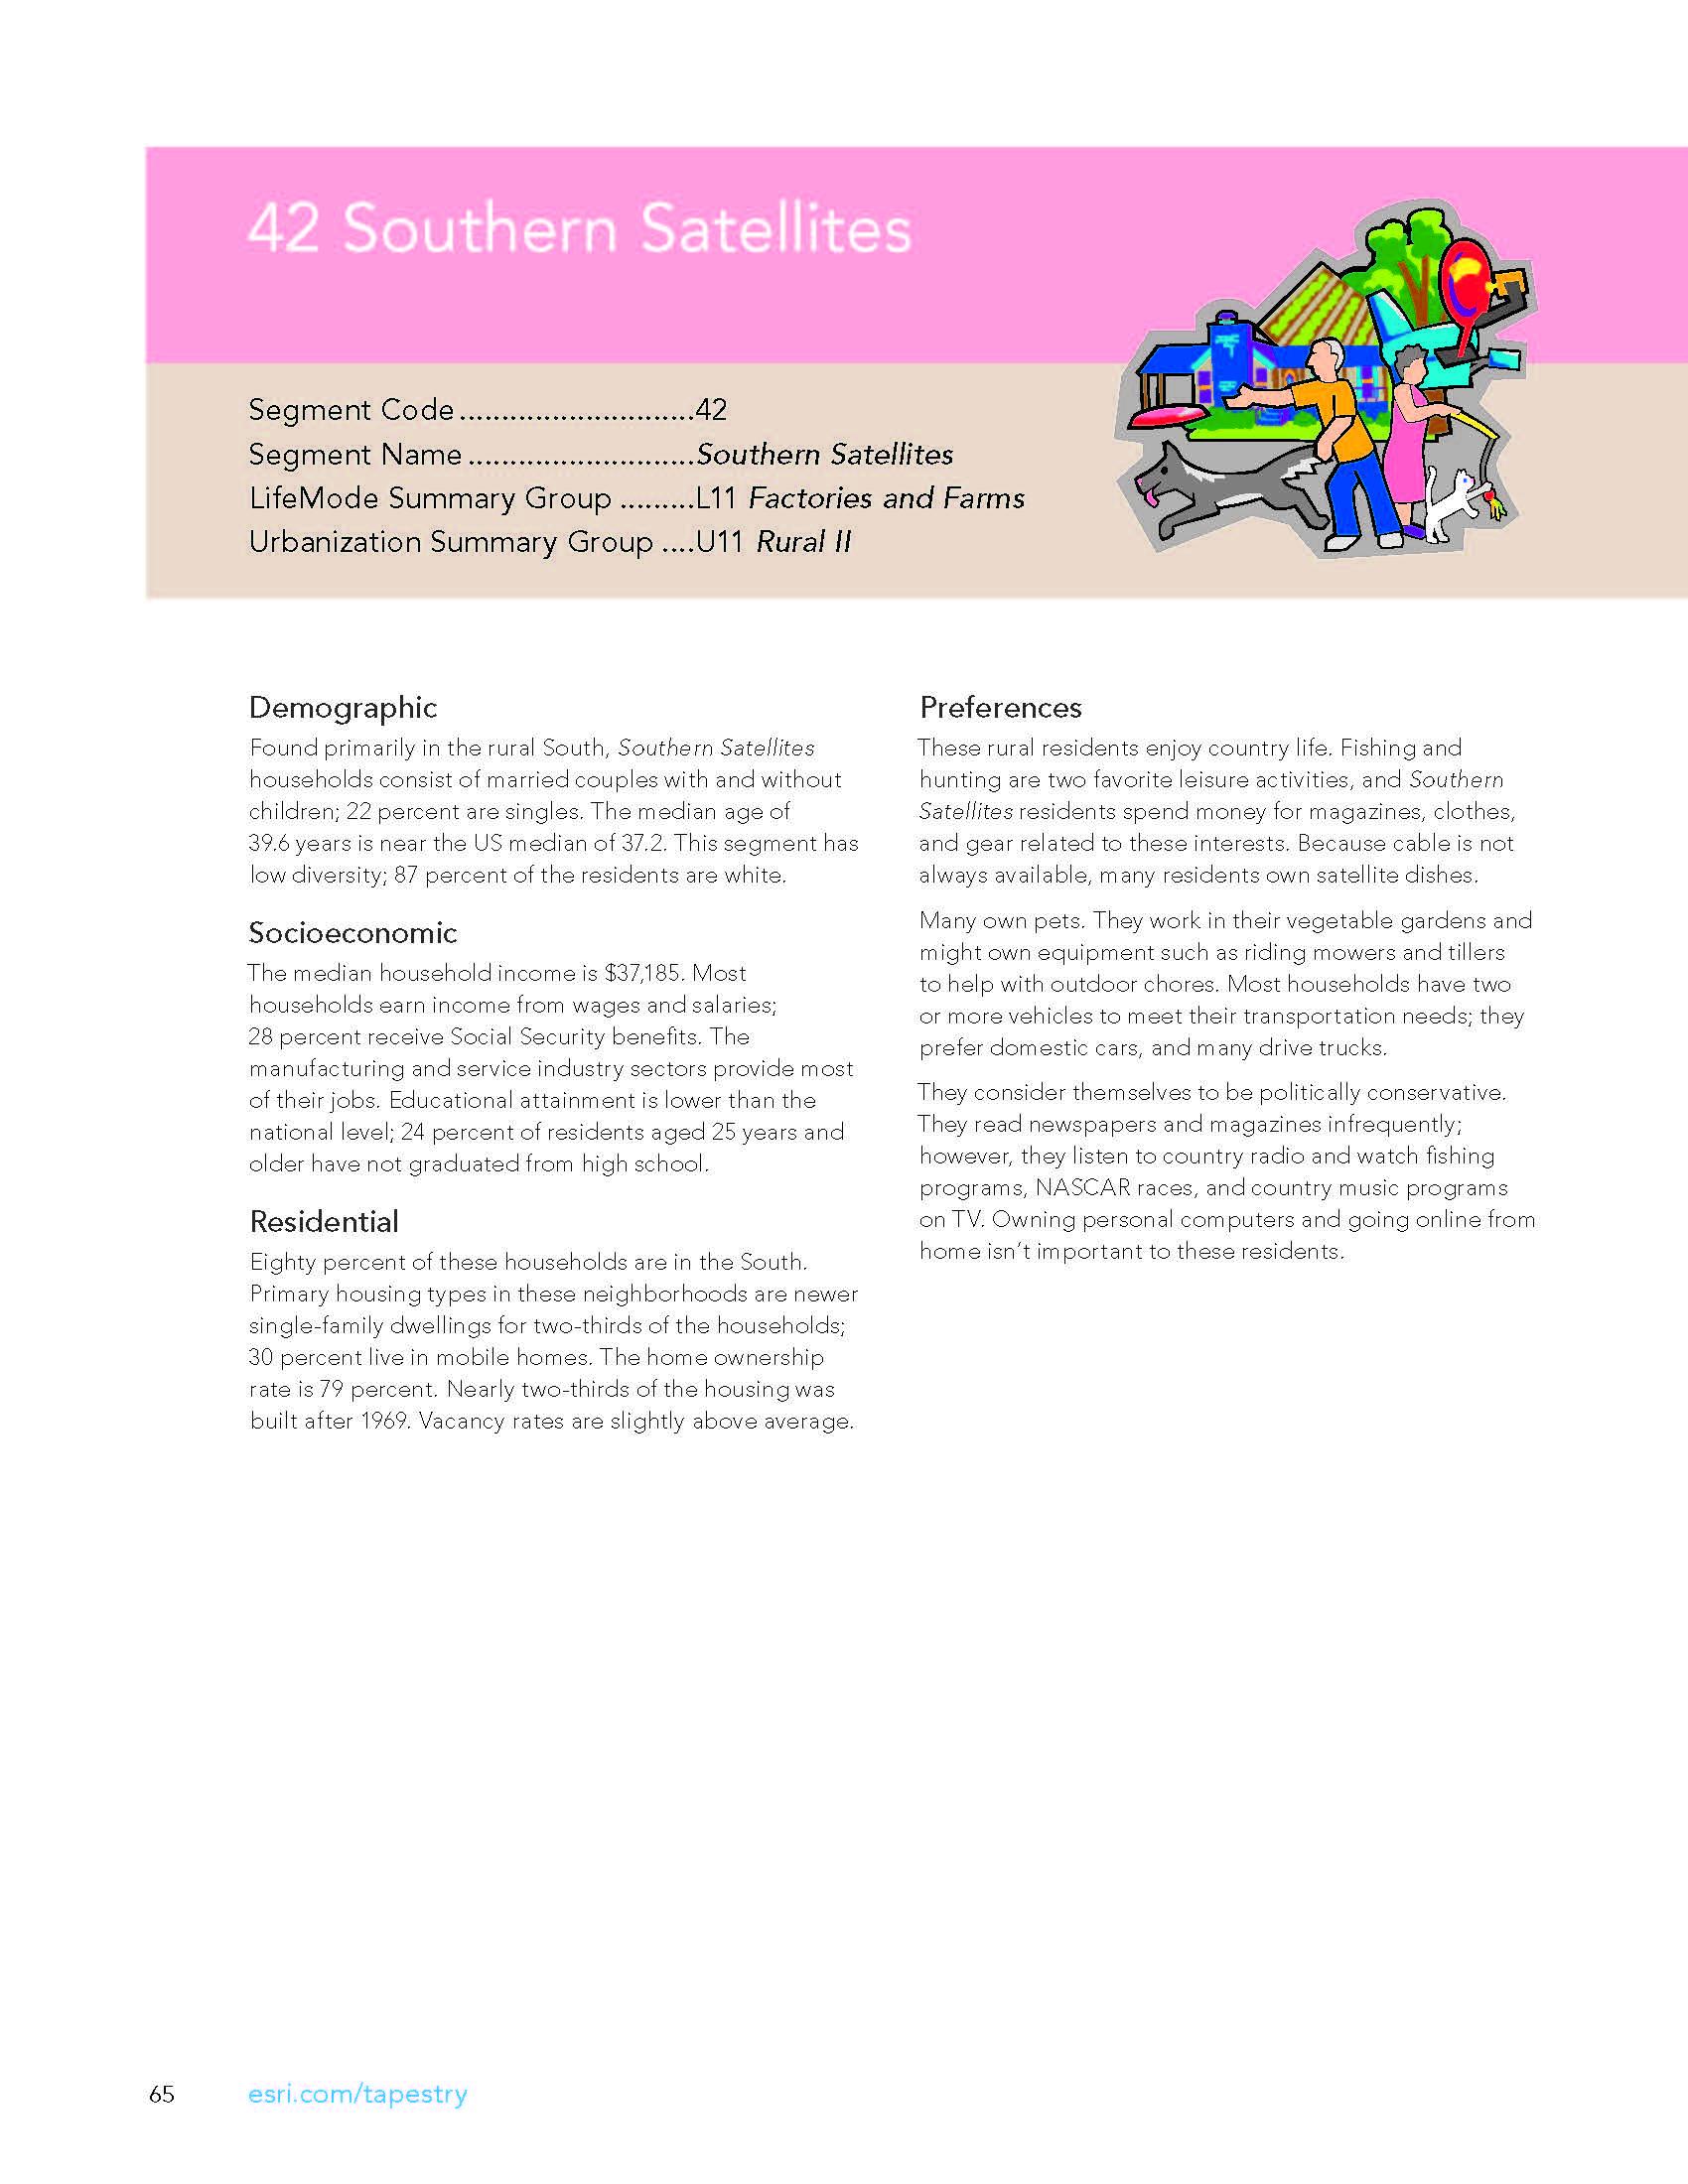 tapestry-segmentation_Page_68.jpg